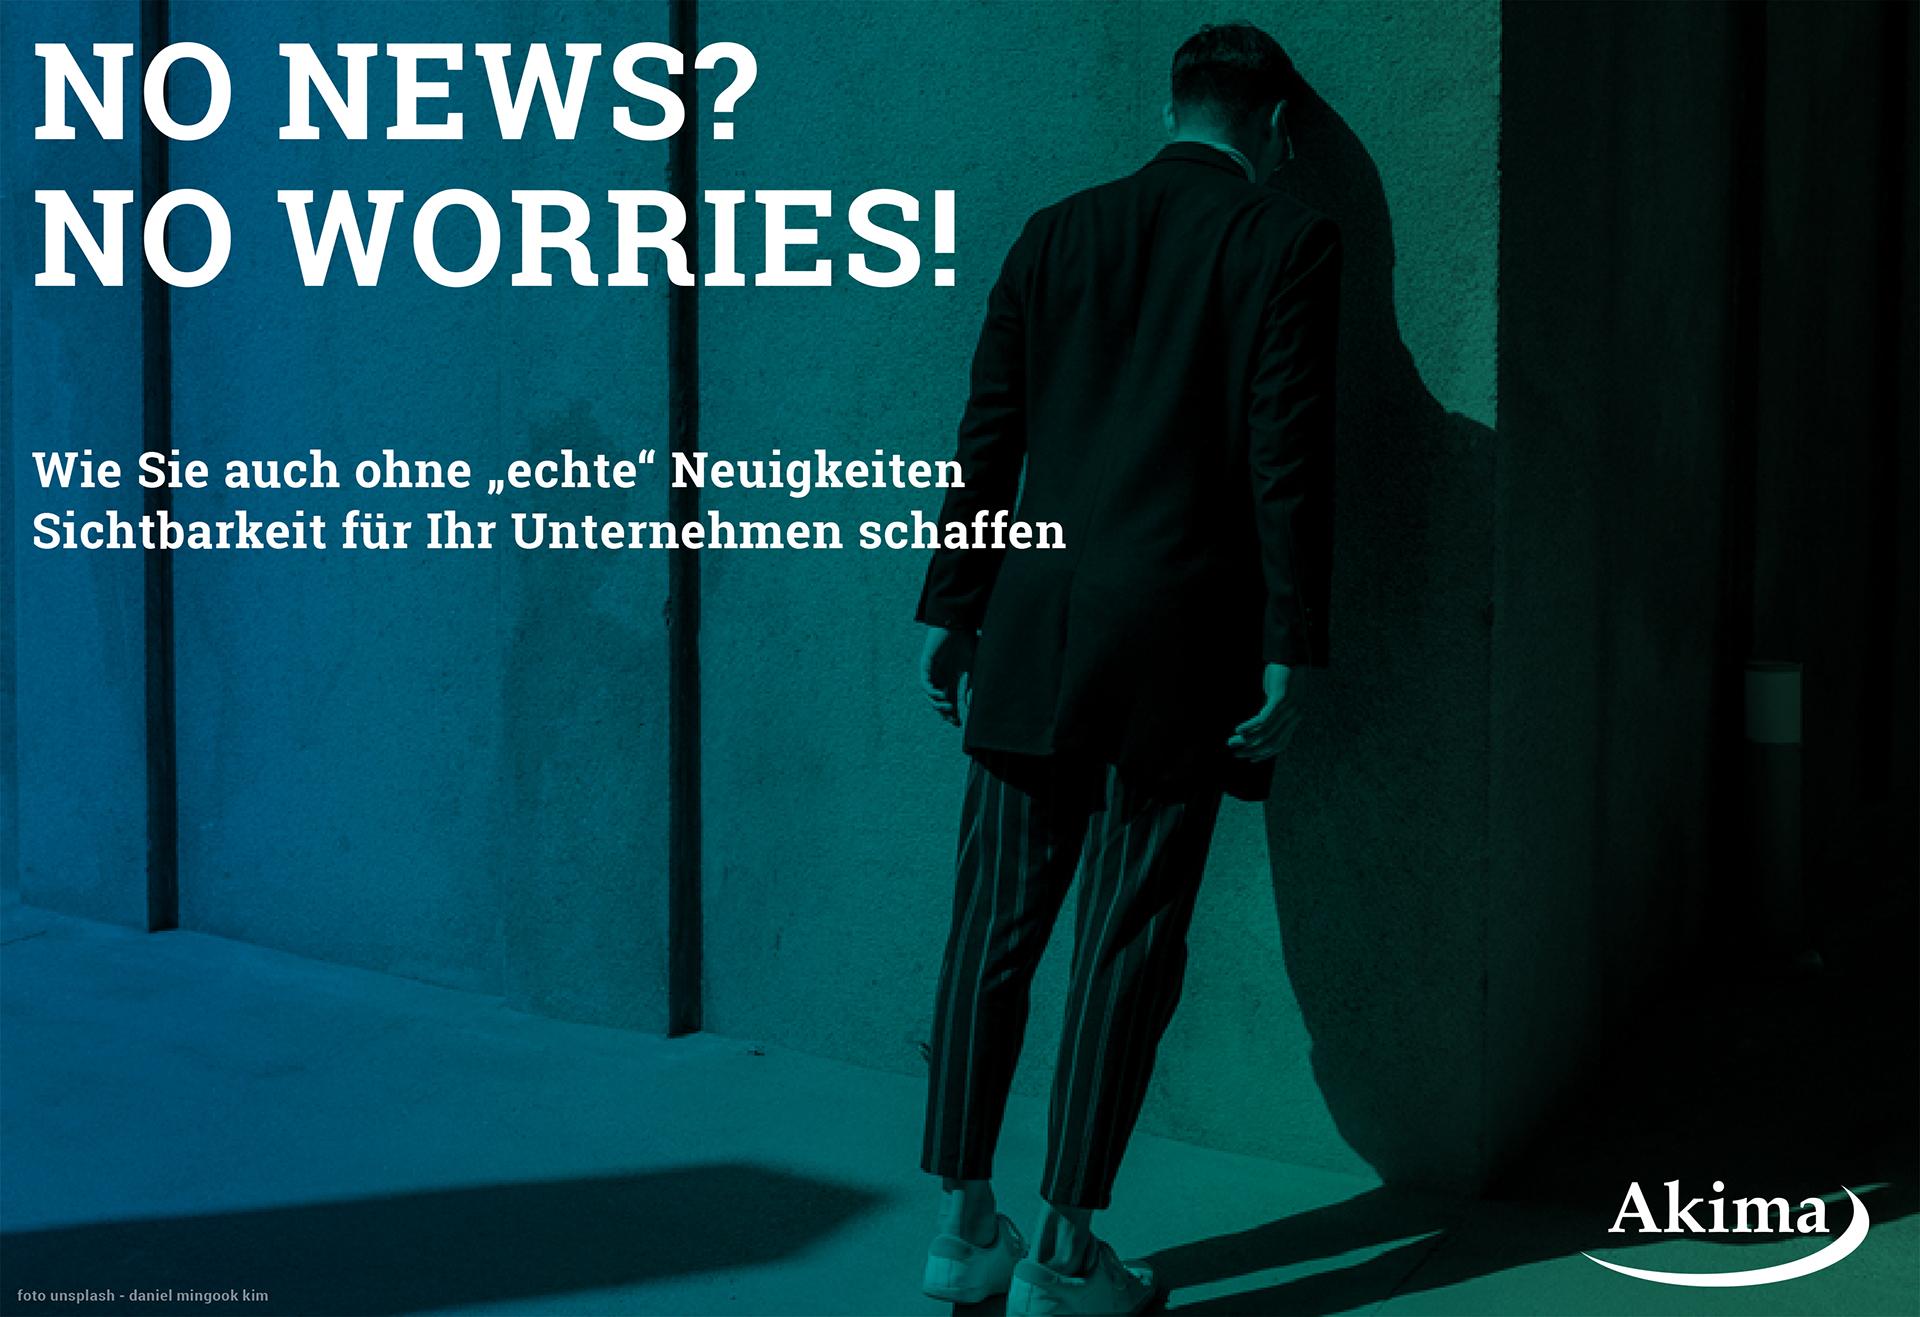 Whitepaper No News No Worries